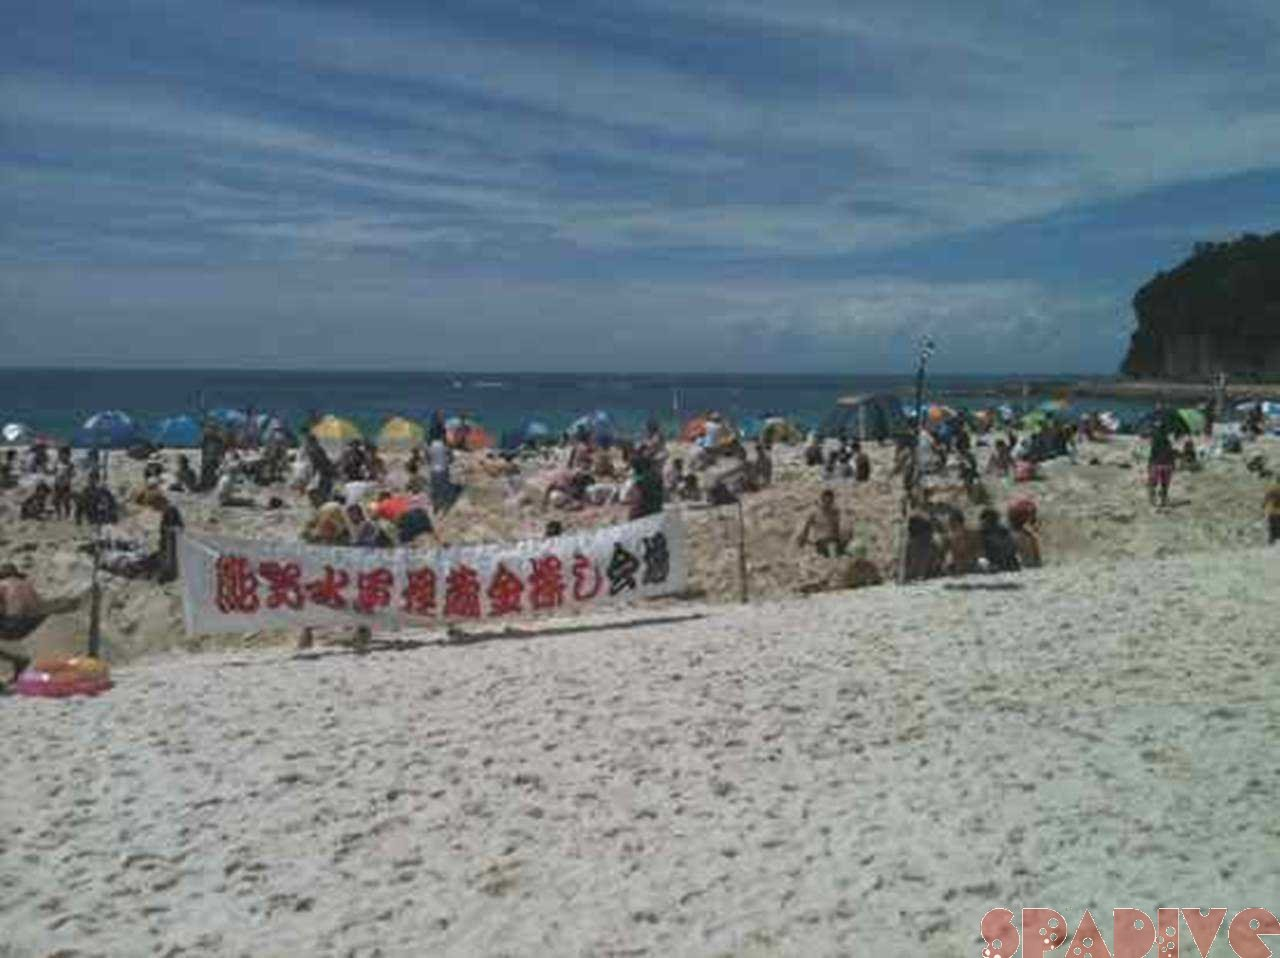 熊野水軍埋蔵金探し|8/26/2011南紀白浜白良浜